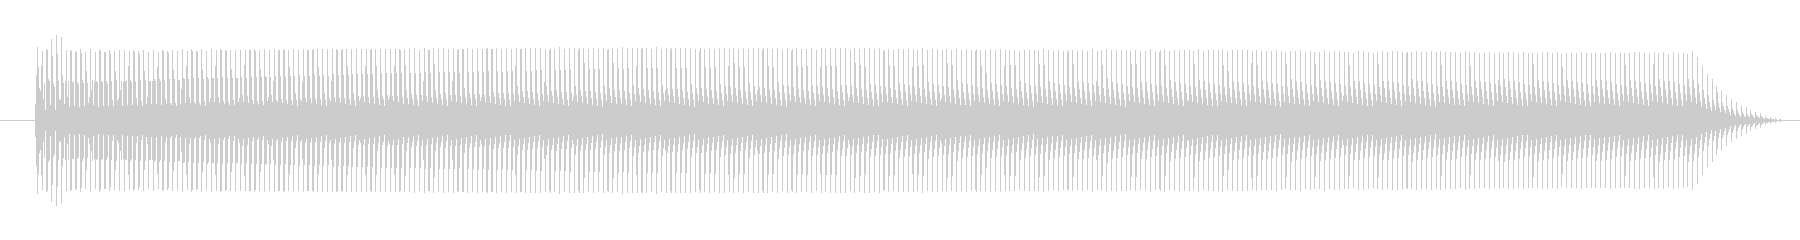 FX テレポート01の未再生の波形